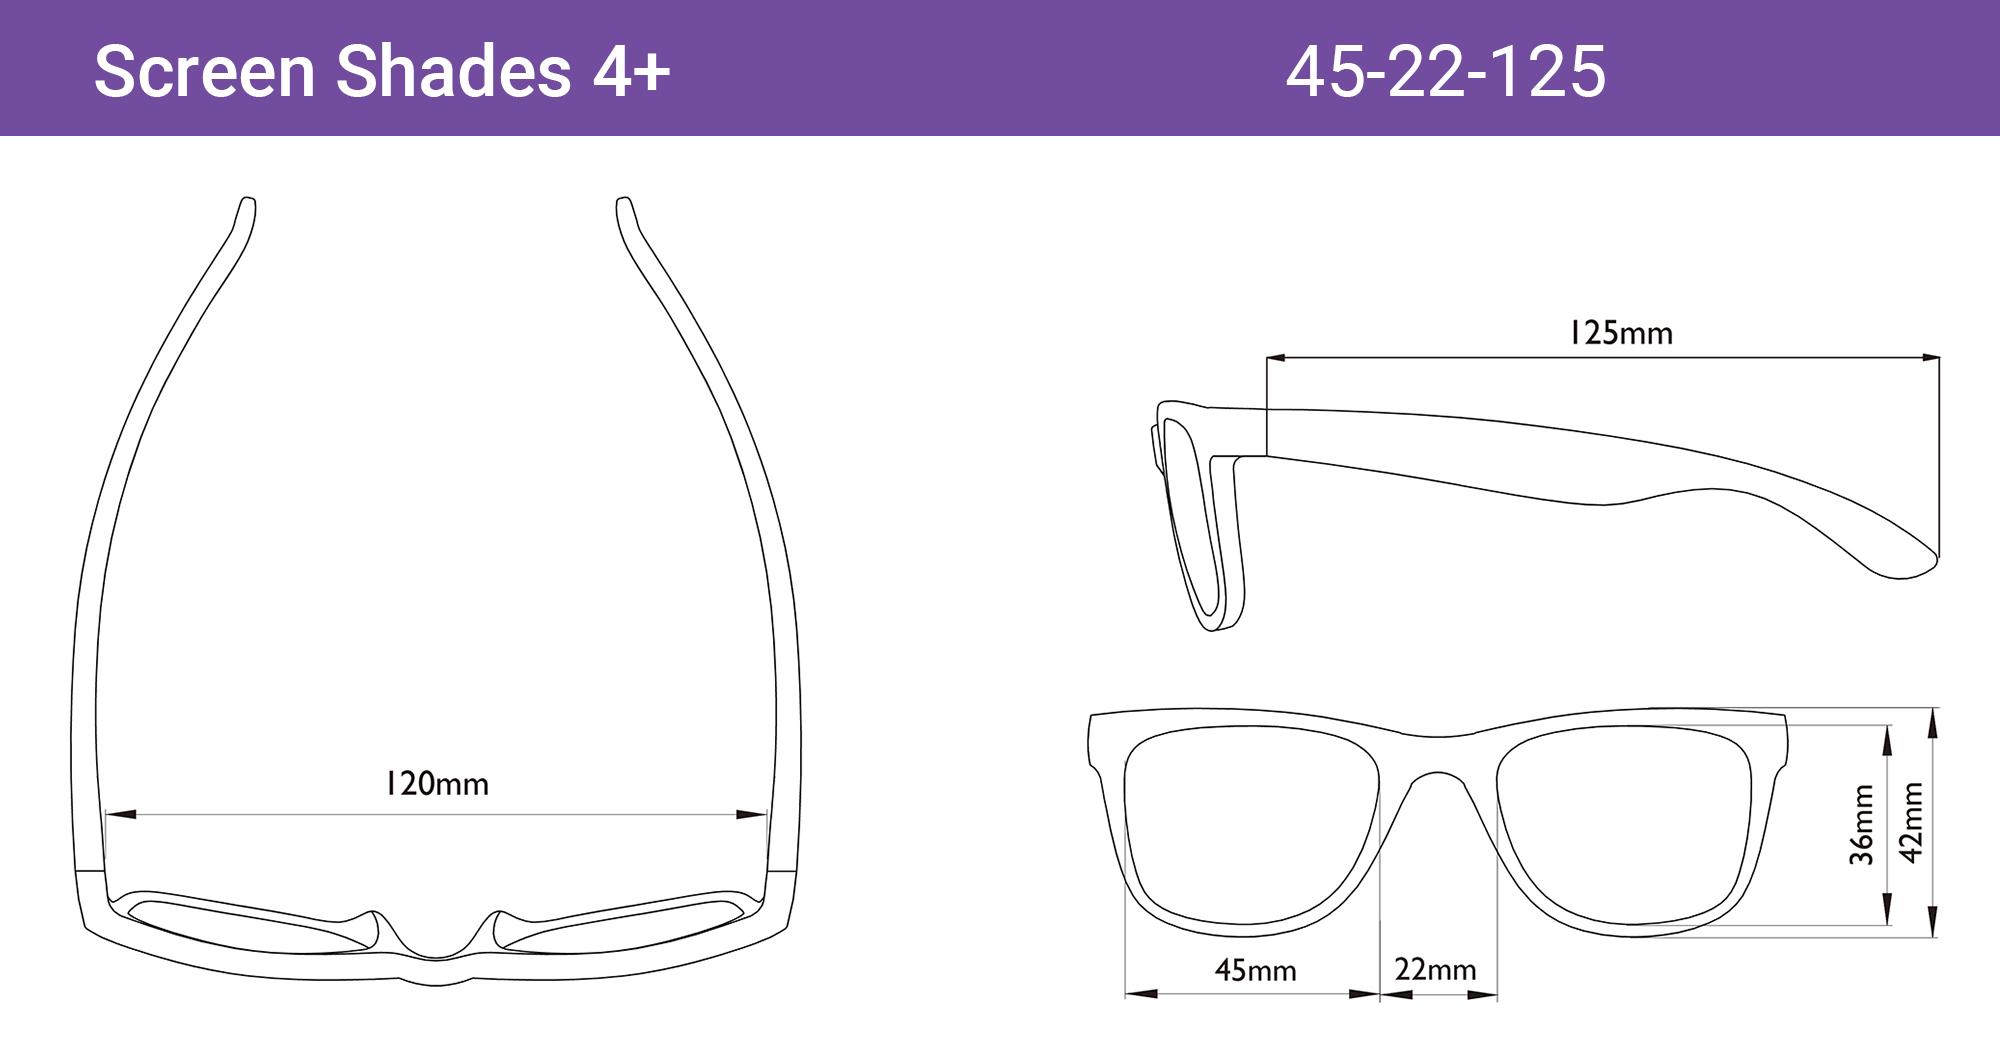 938f763751 Screen Shades Computer Glasses for Kids - Real Kid Shades